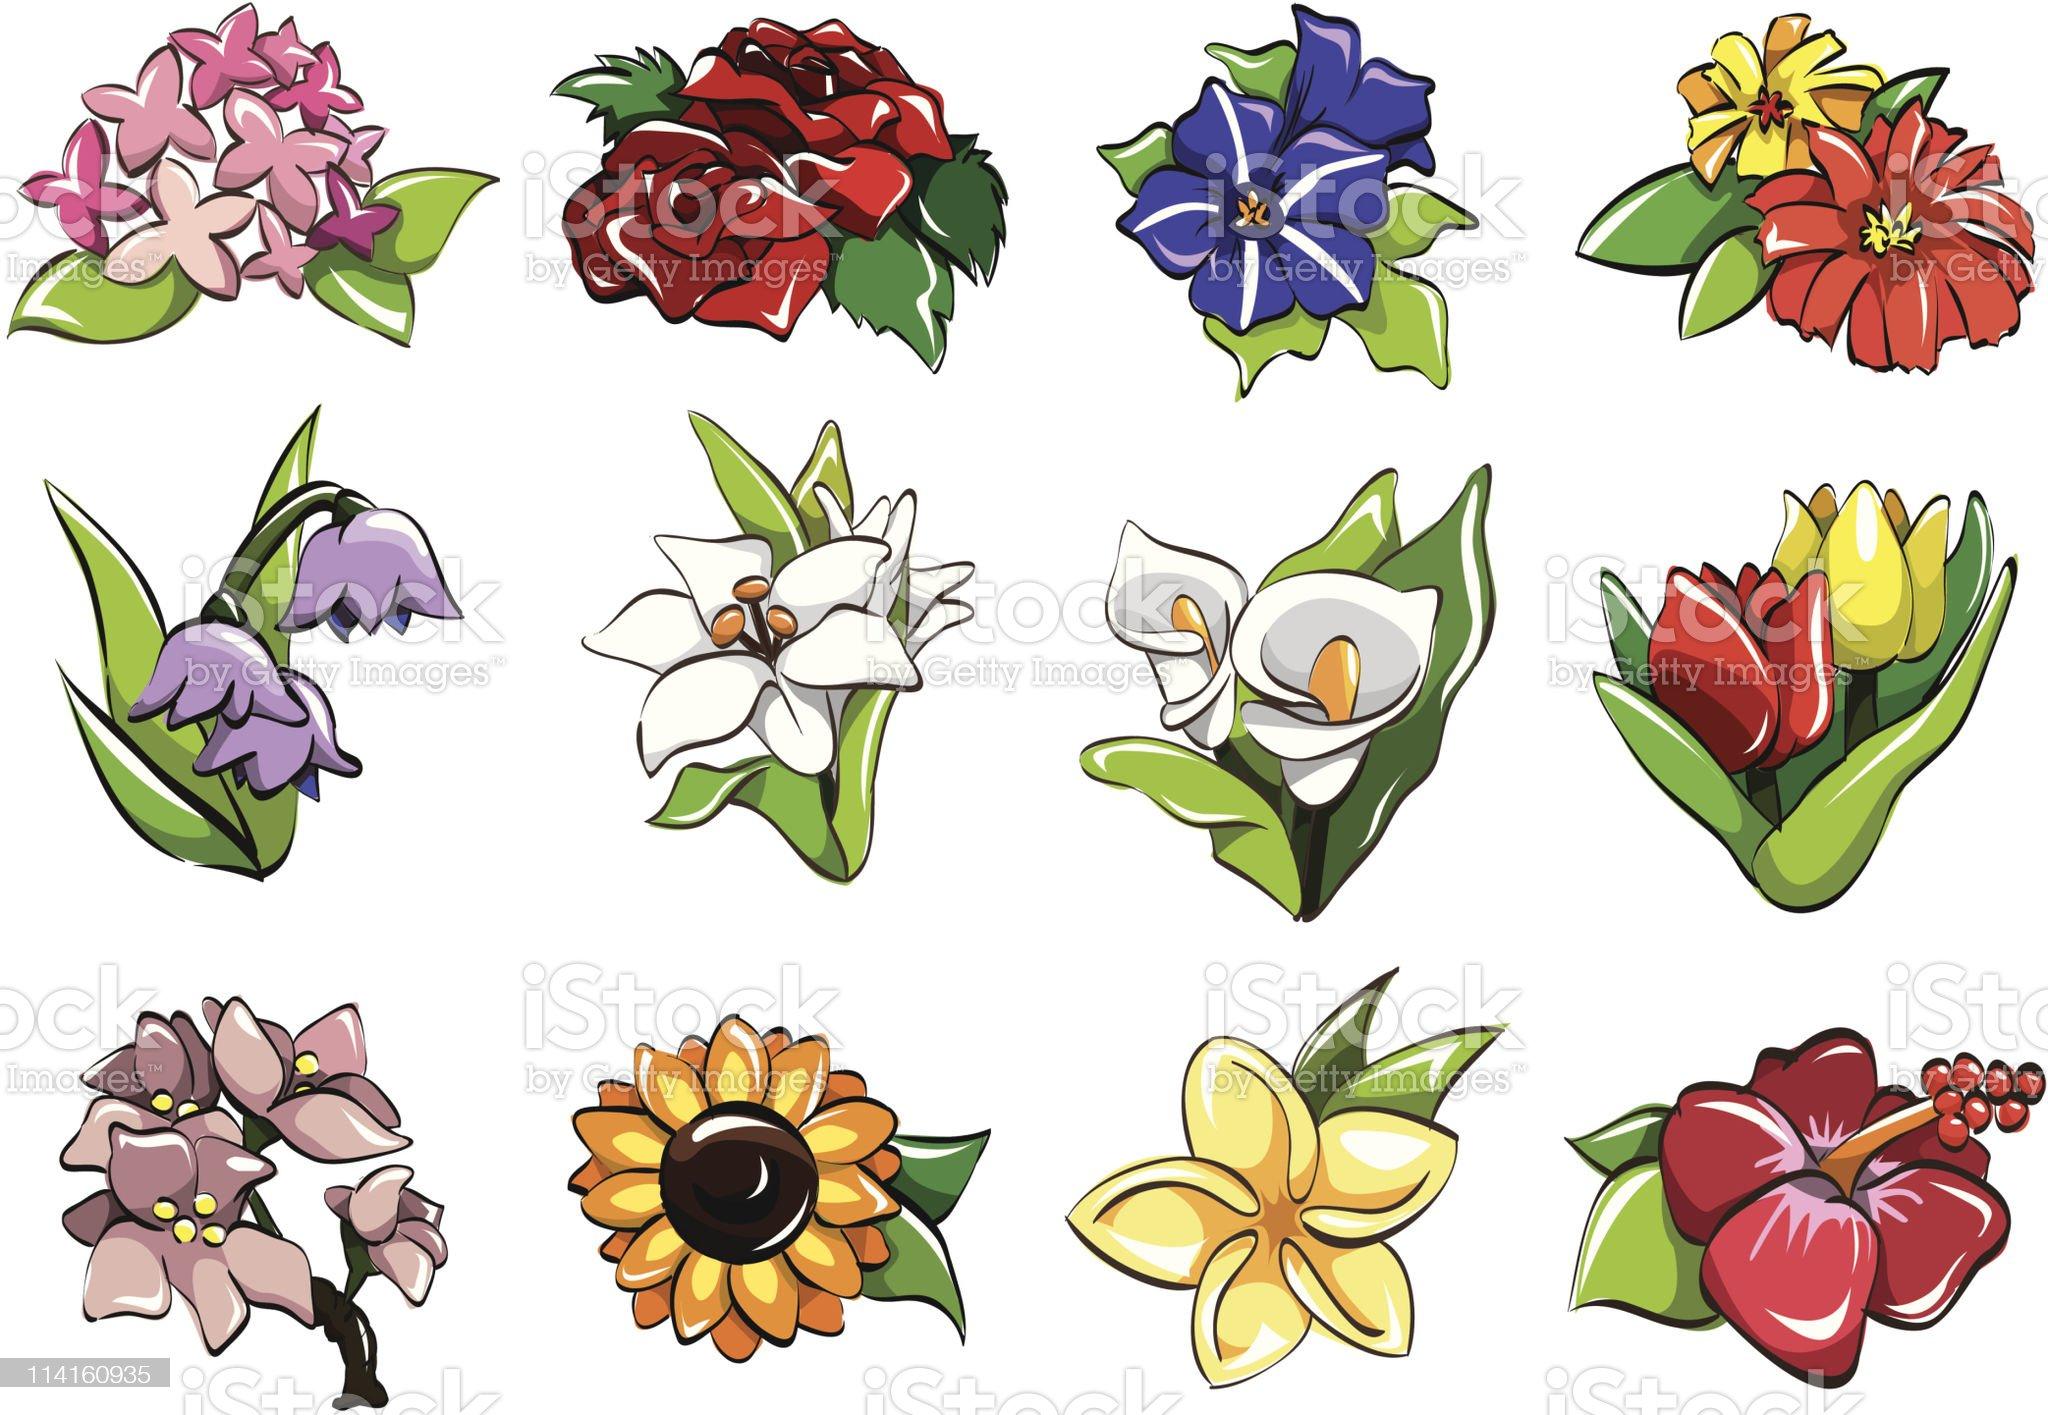 cartoon flower icon royalty-free stock vector art